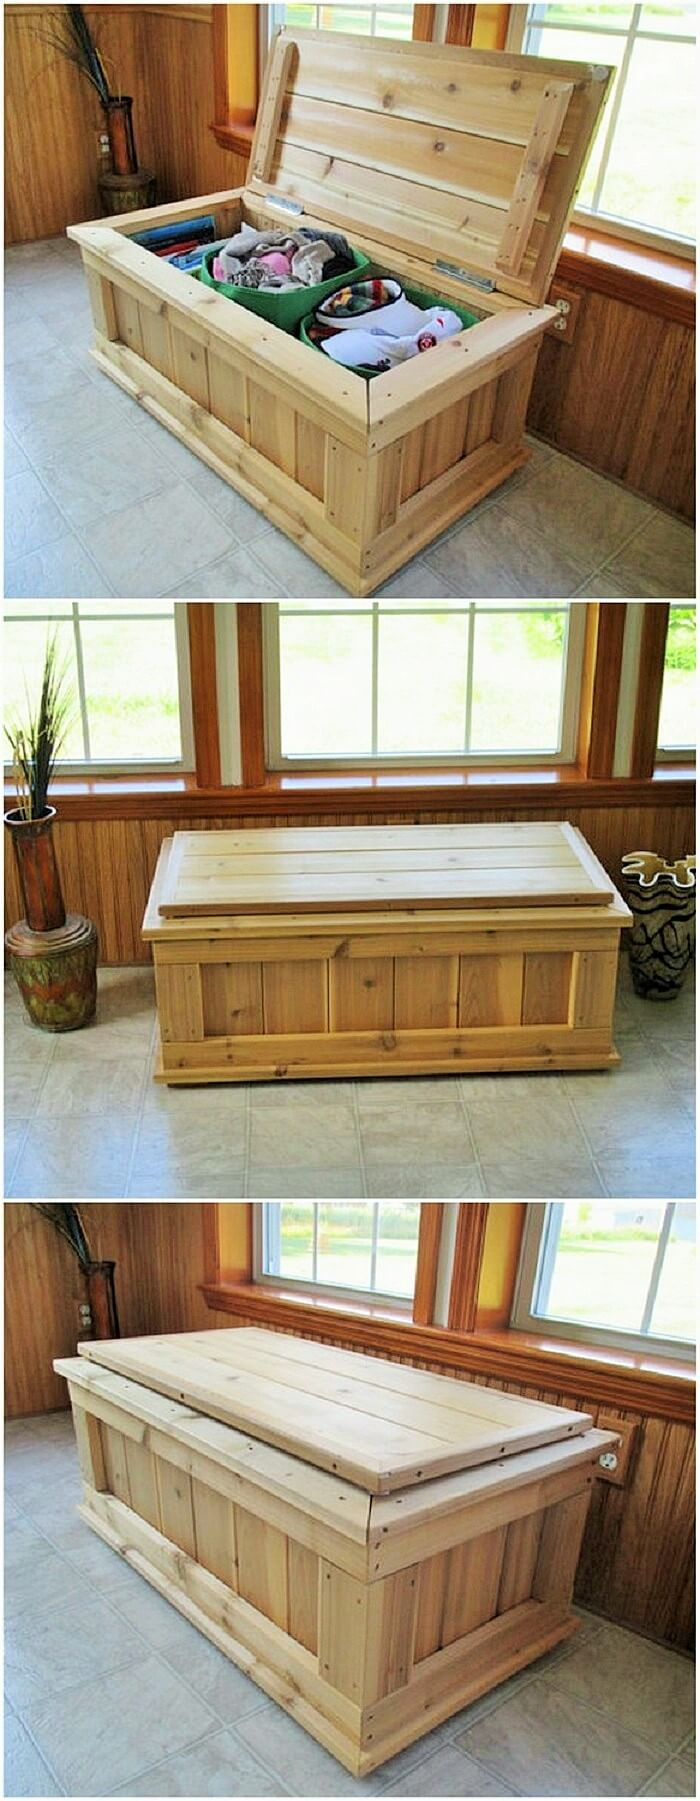 DIY-Wodden-Pallet-Furniture-Projects-17 (2)